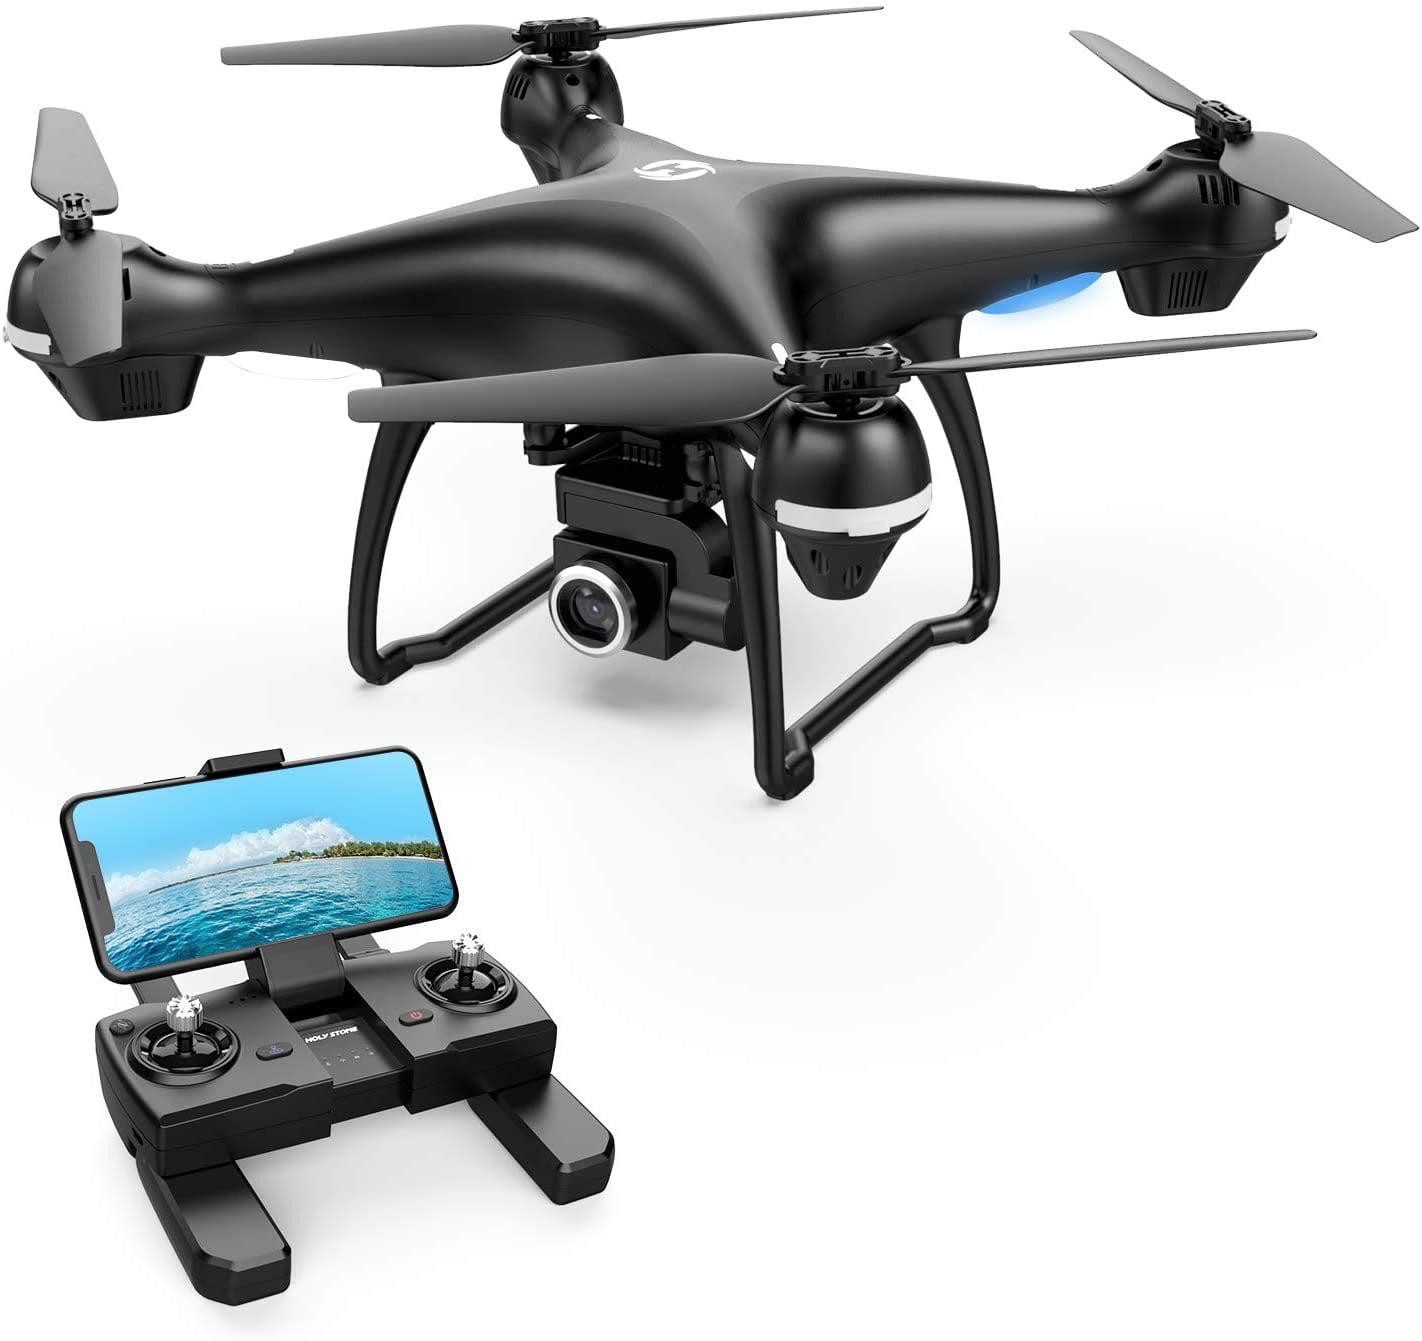 Protocol 6182-7XBH Kaptur GPS II Wi-Fi Drone CONTROLLER ONLY NEW